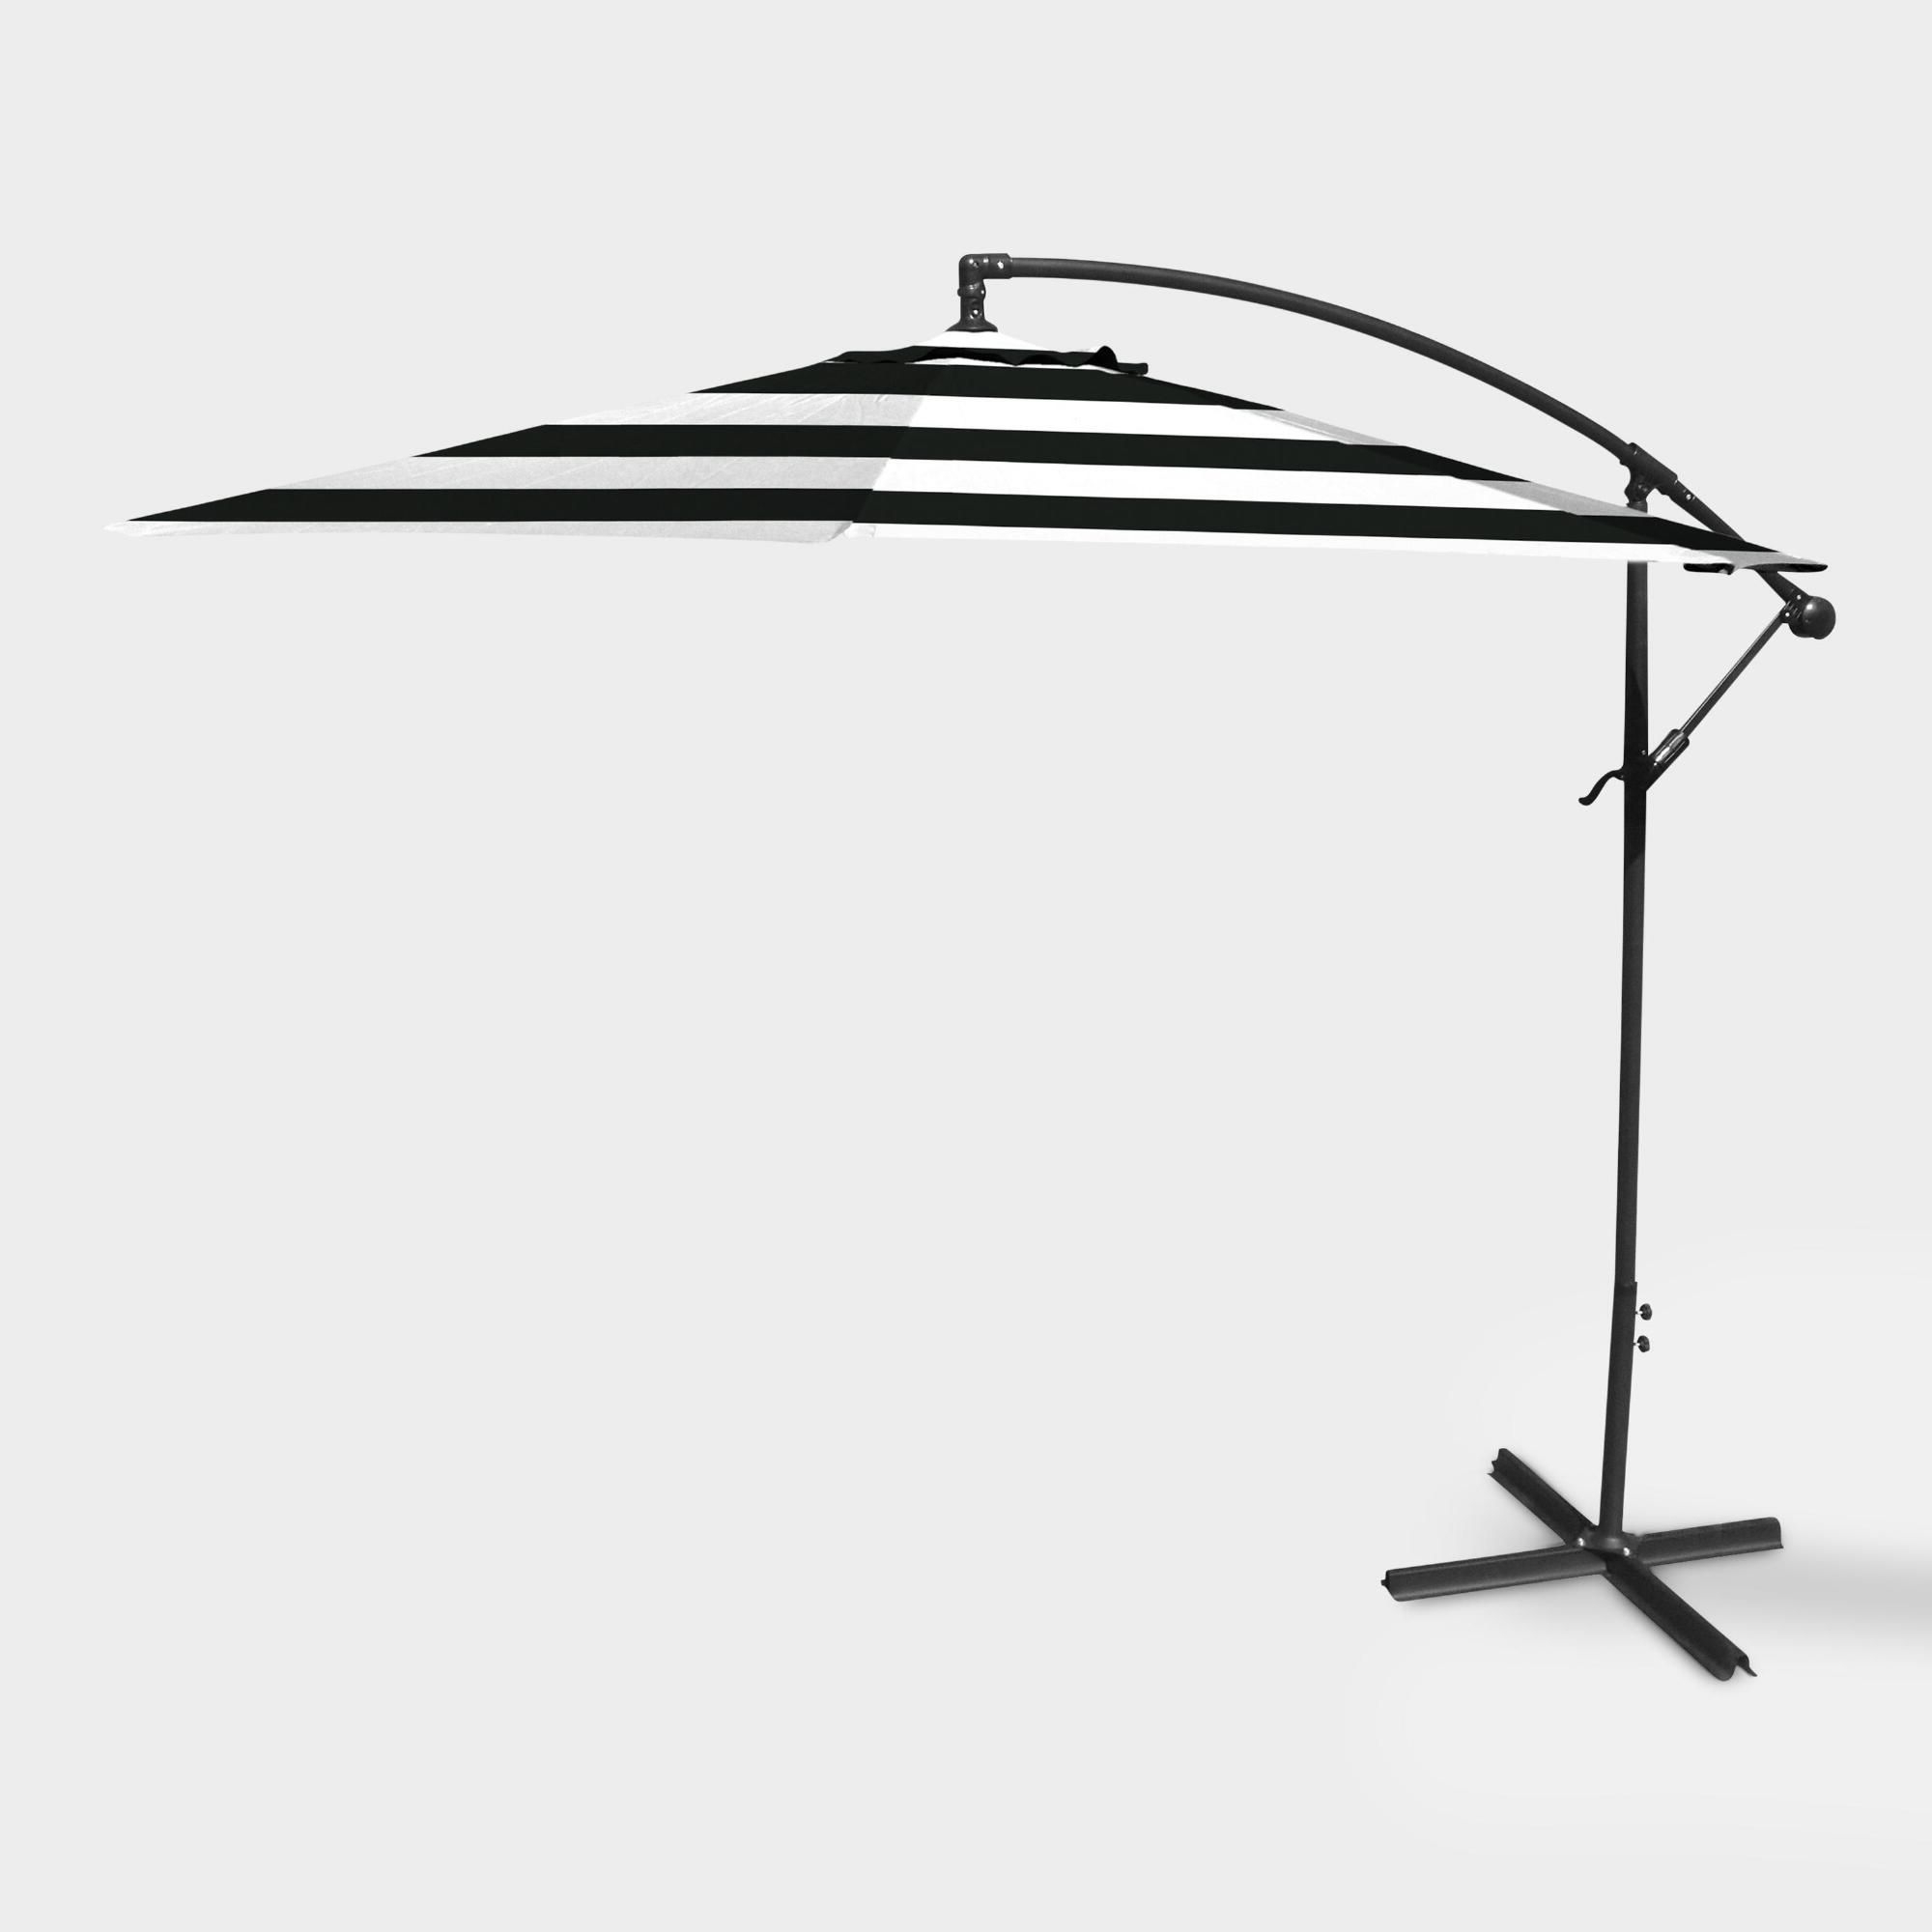 Wieczorek Auto Tilt Rectangular Market Sunbrella Umbrellas Within Most Recently Released Black Stripe 10 Ft Cantilever Outdoor Patio Umbrellaworld Market (View 20 of 20)